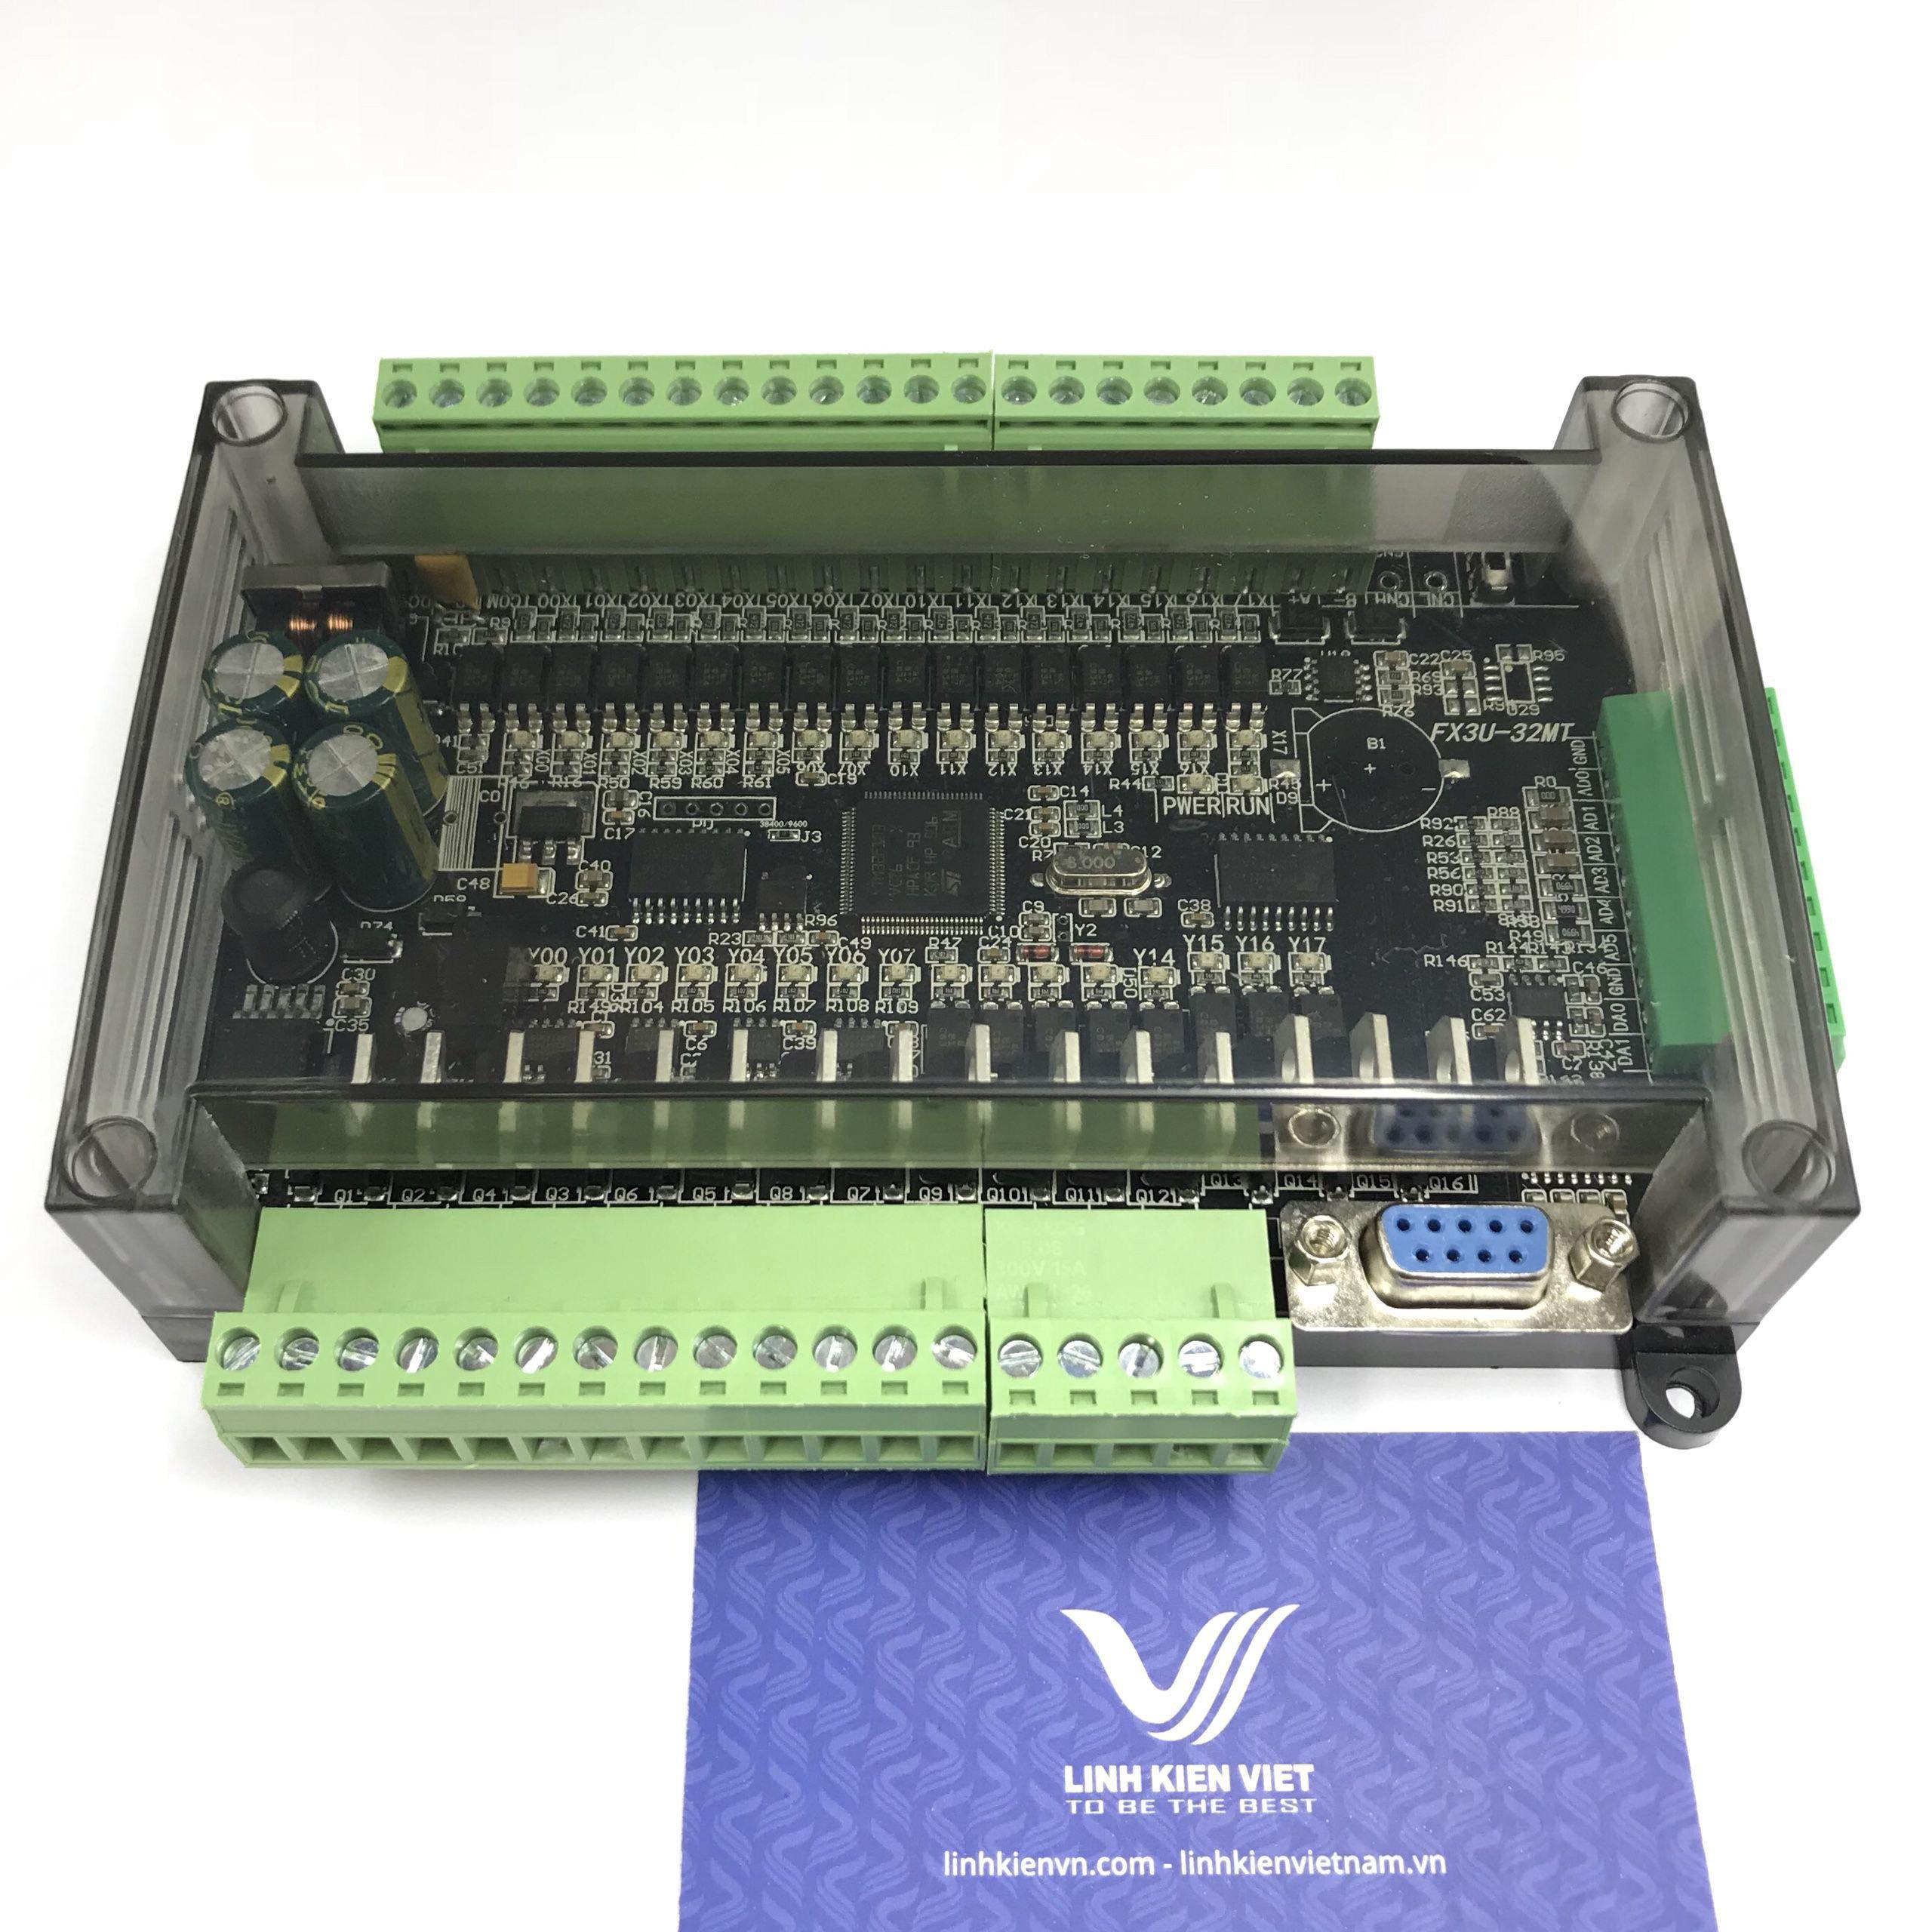 BOARD PLC FX3U - 32MT có vỏ tích hợp 6AD 2DA